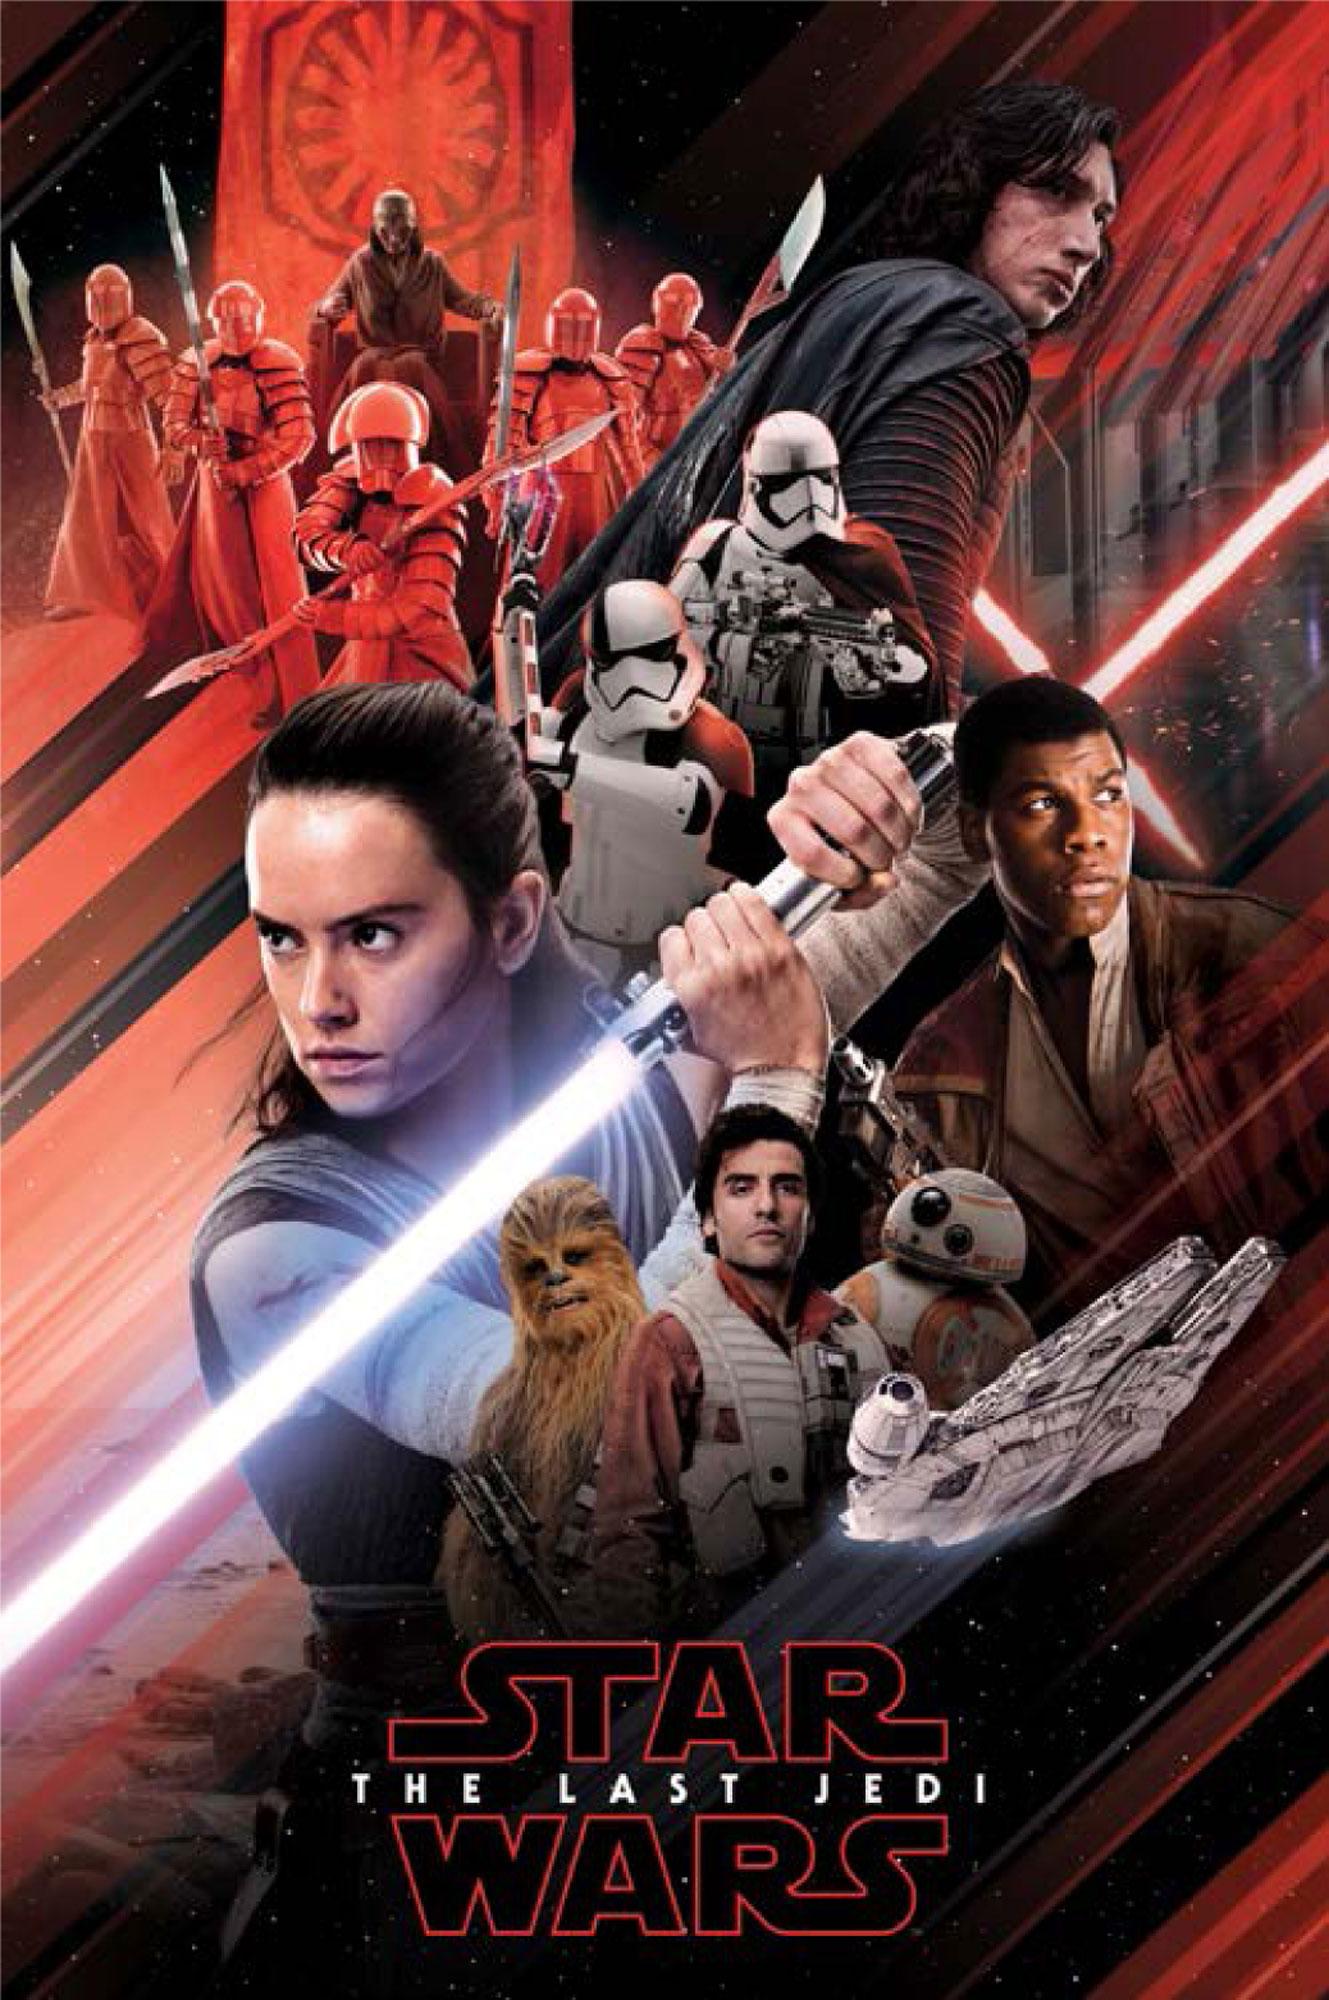 Star Wars - The Last Jedi - Red Montage - Poster Plakat - Größe ...